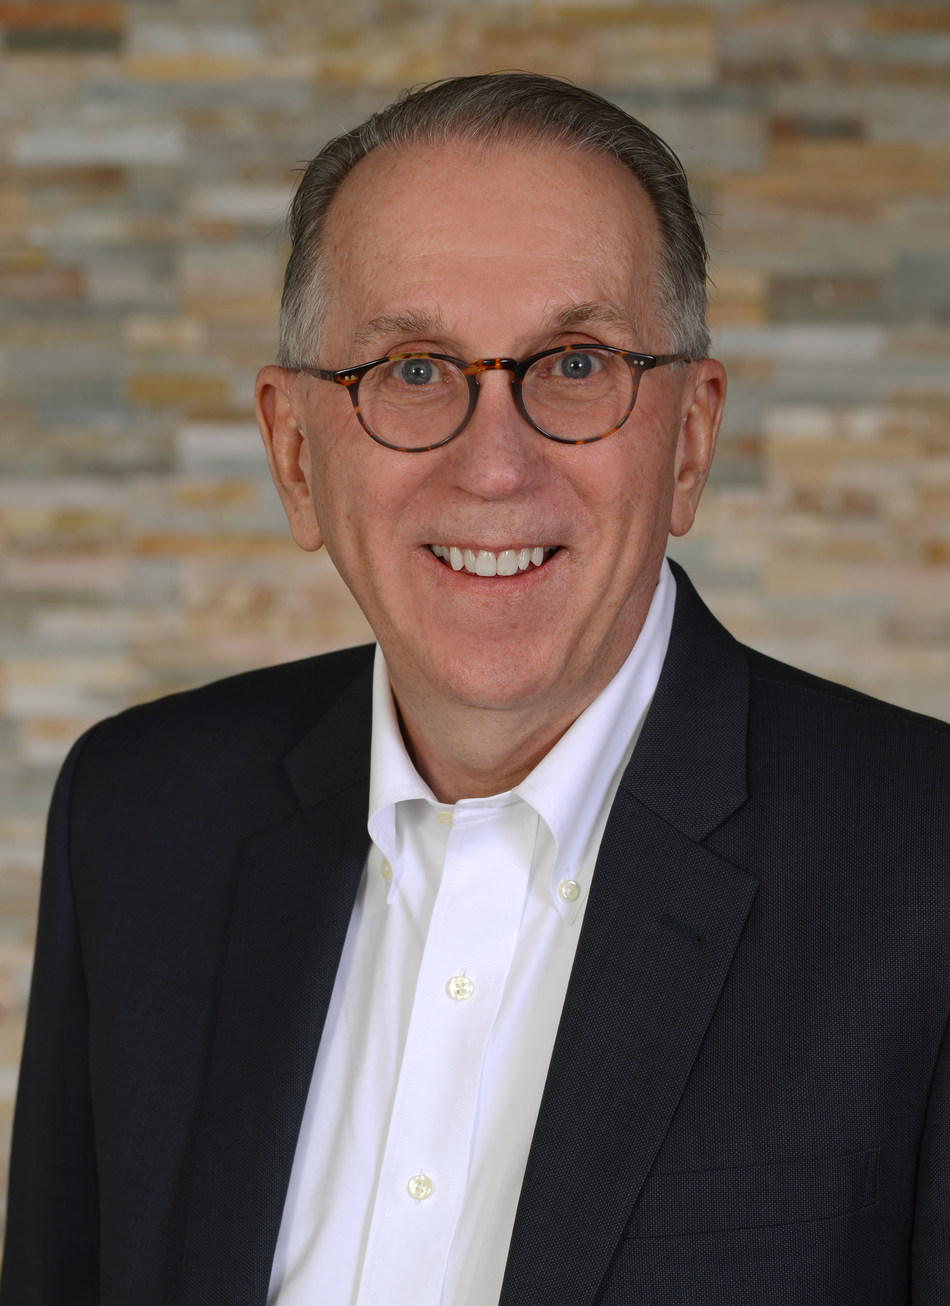 Richard Larison, Executive Vice President of Market Development, Continuum Health Alliance